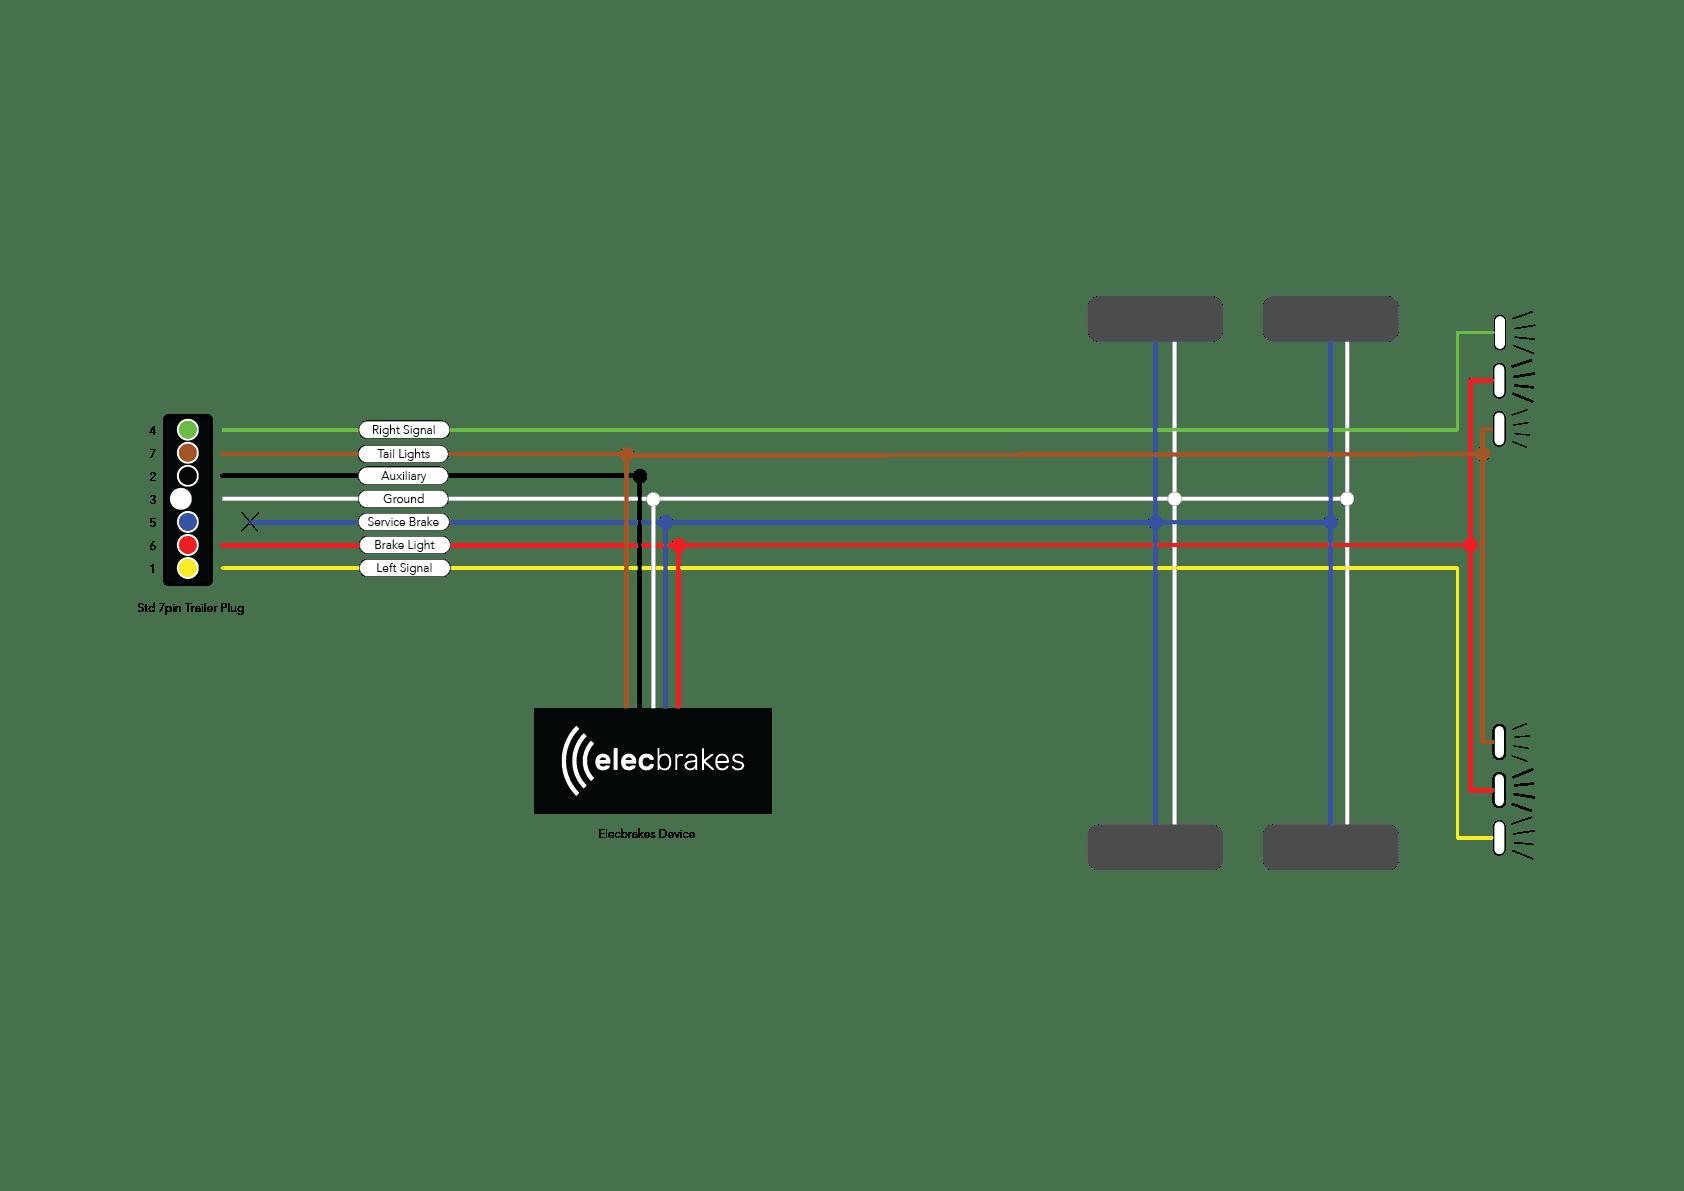 AZ_6638] Trailer Plug Wiring Diagram Electric Brakes Free DiagramOphag Numap Mohammedshrine Librar Wiring 101